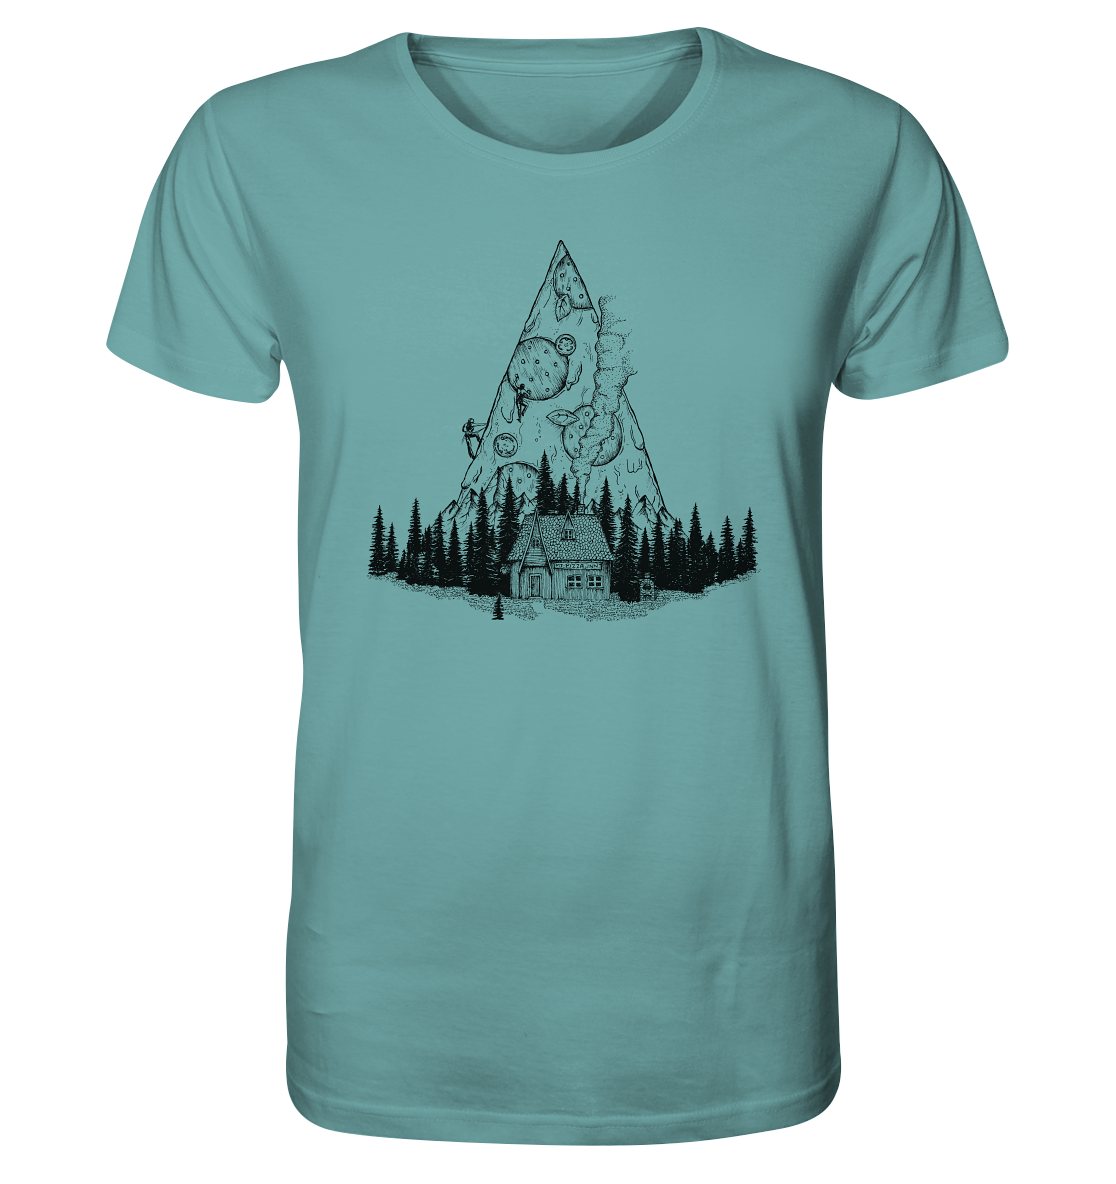 front-organic-shirt-70a7a7-1116x-5.png